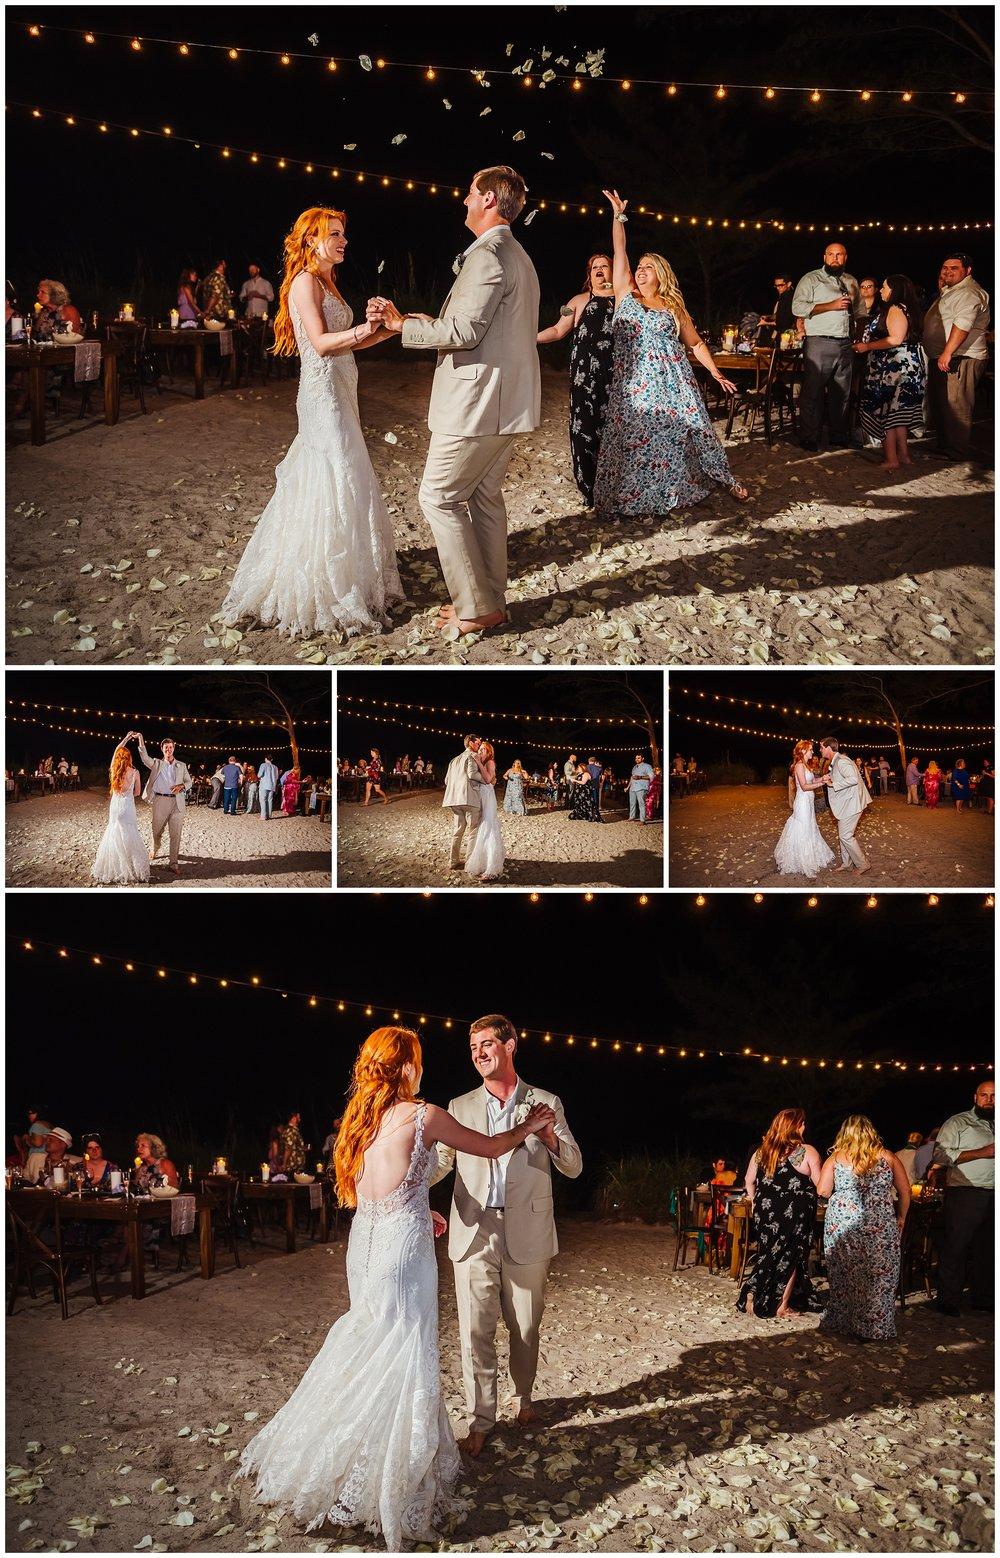 tampa-st-pete-wedding-photographer-indian-rocks-beach-mermaid-train-redhead_0181.jpg